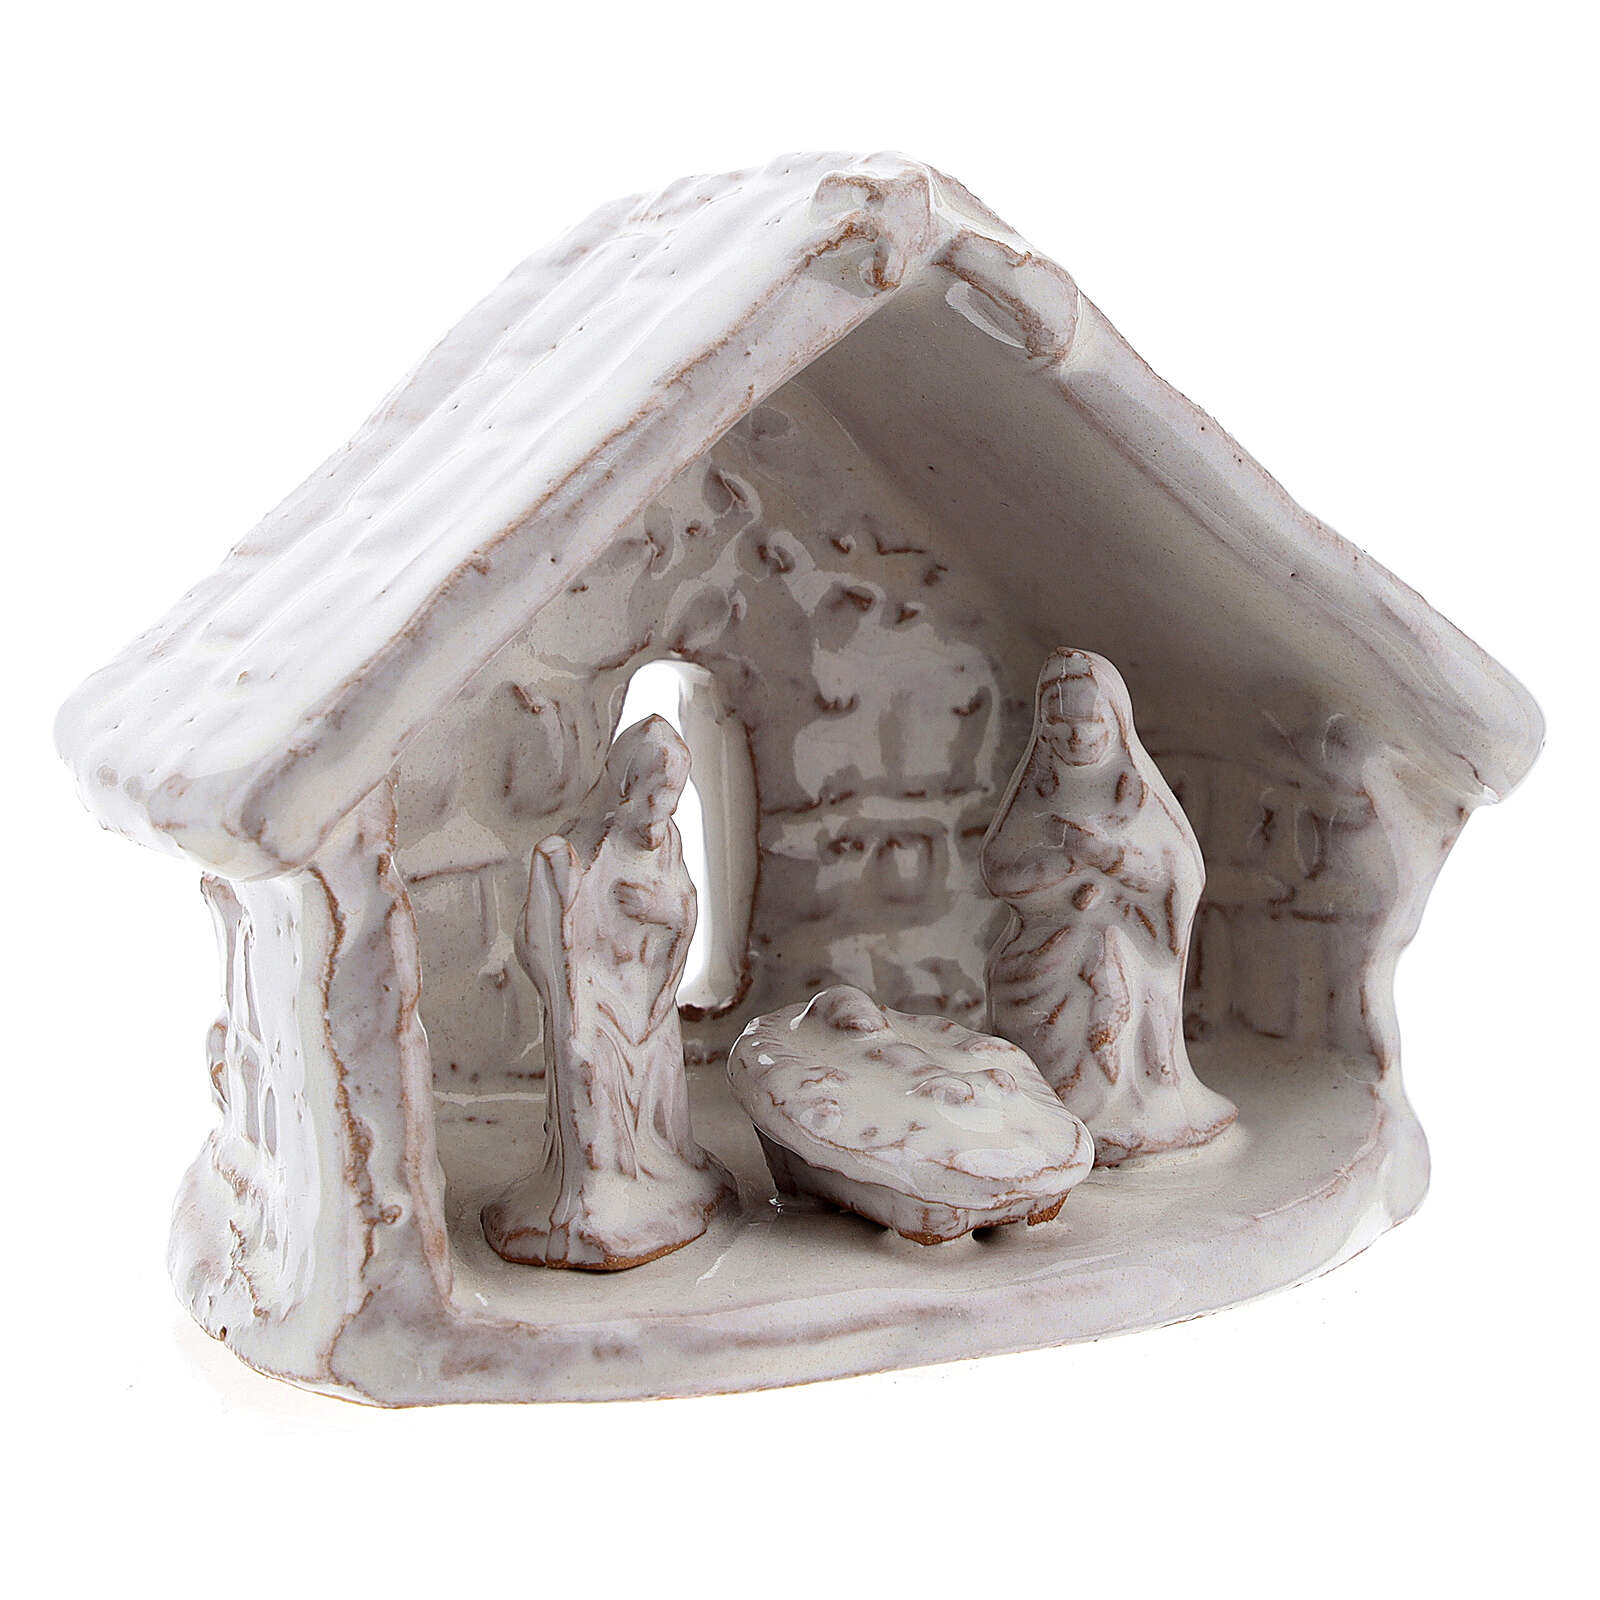 Mini cabane nativité 6 cm terre cuite blanche Deruta 4